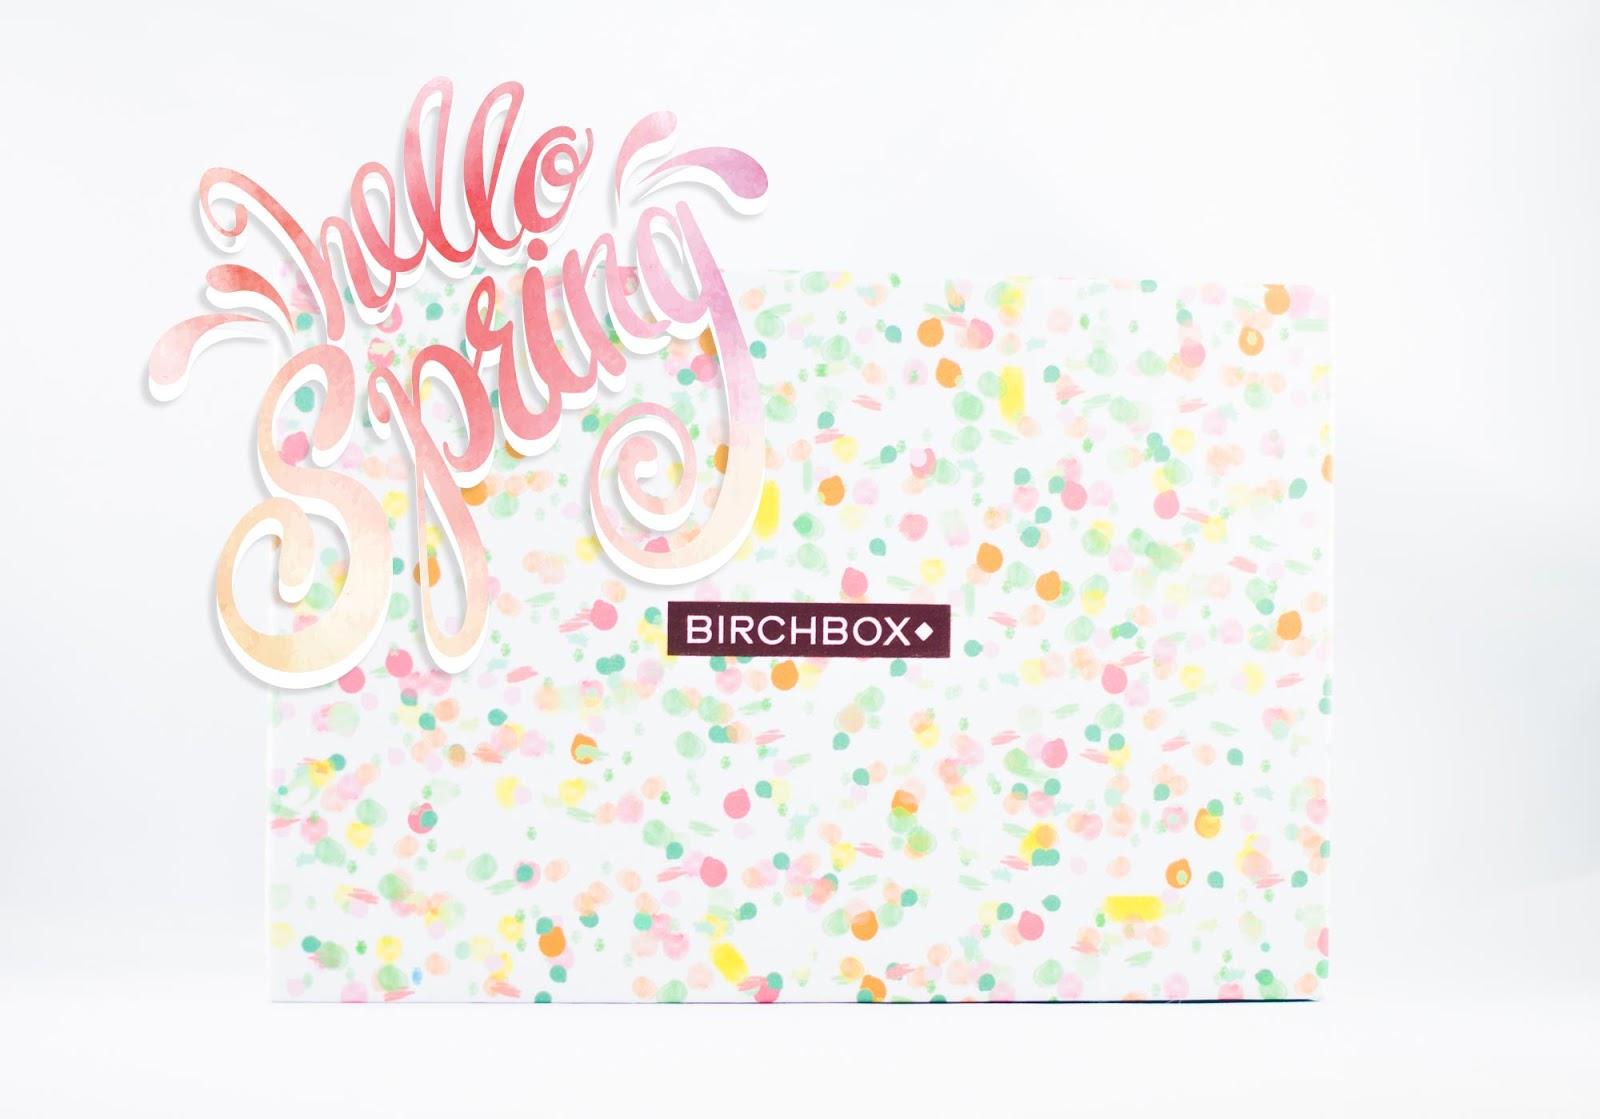 Birchbox mars 2016 Hello Spring beauty box